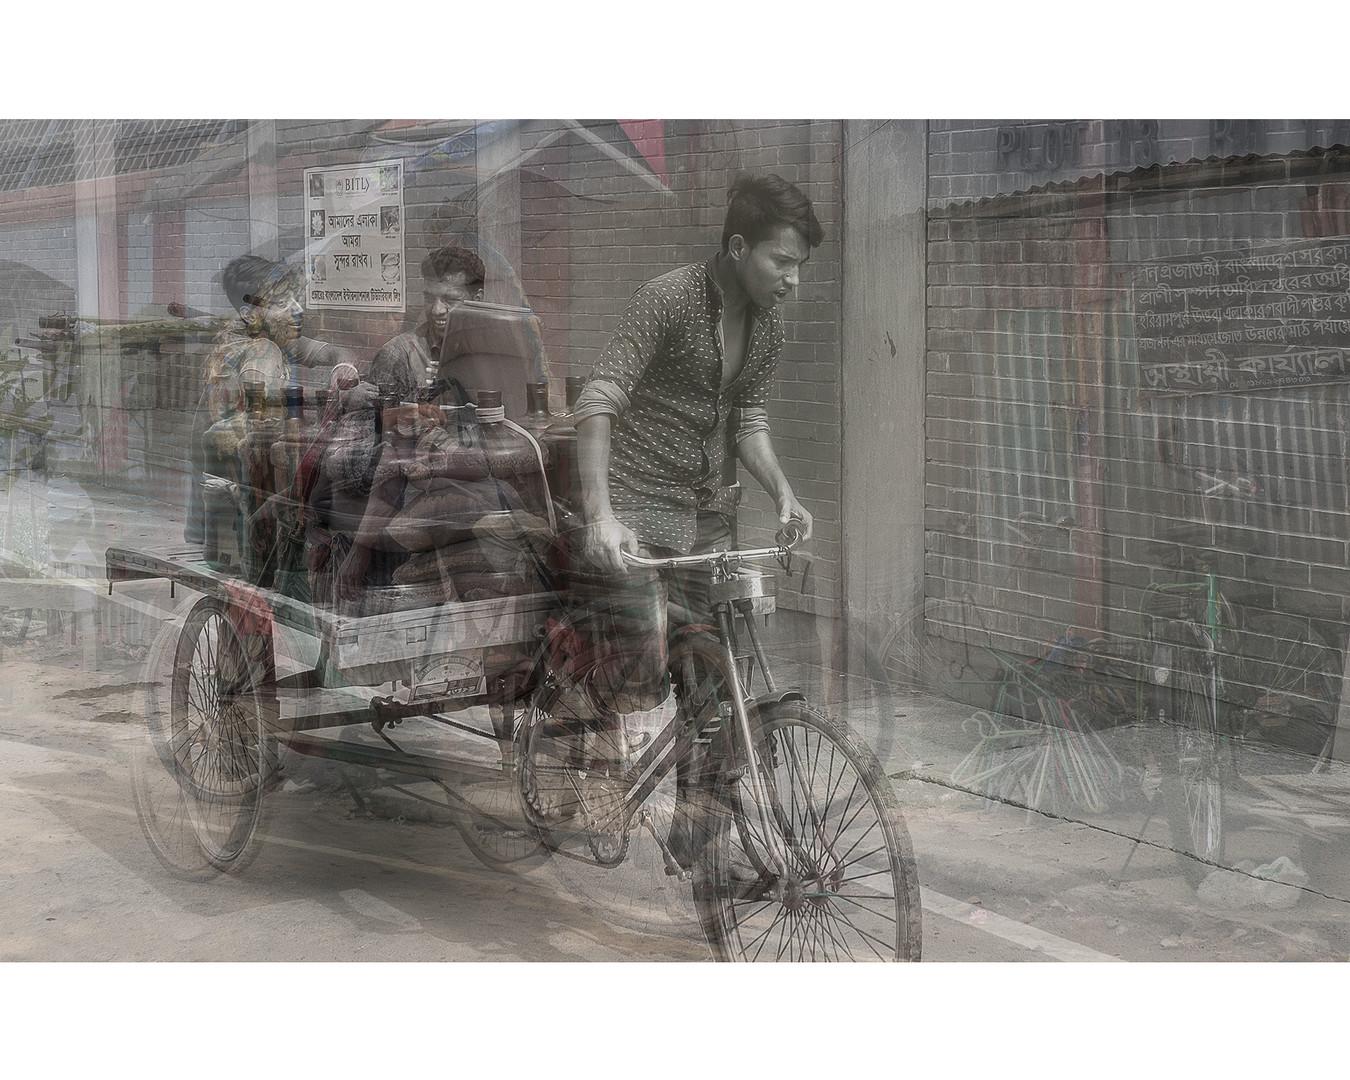 rickshaw_montage_1FB.jpg